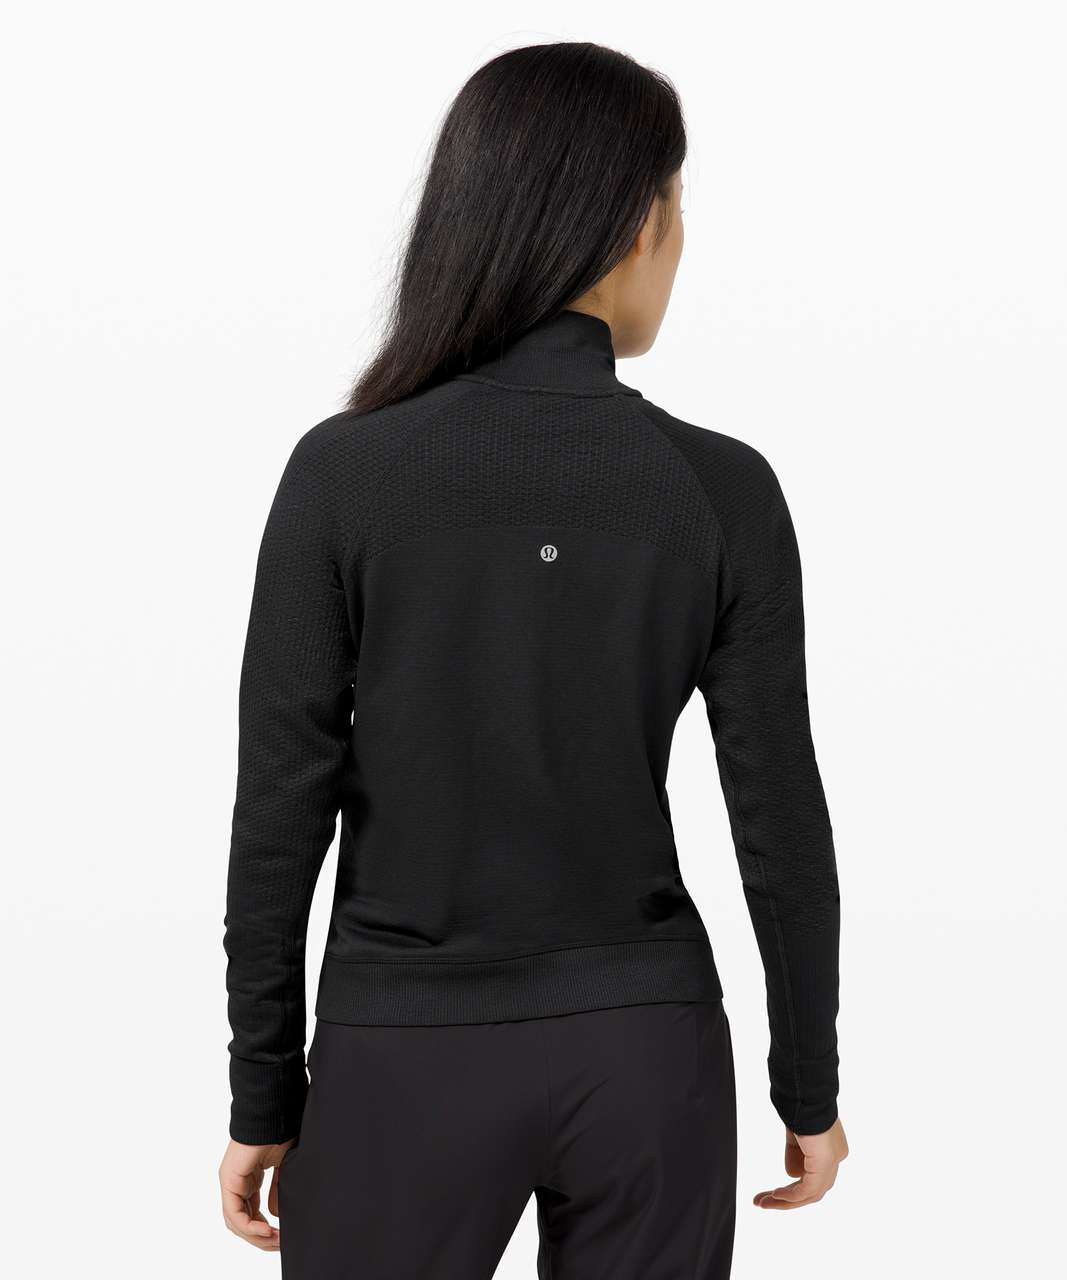 Lululemon Engineered Warmth Half Zip - Black / Black